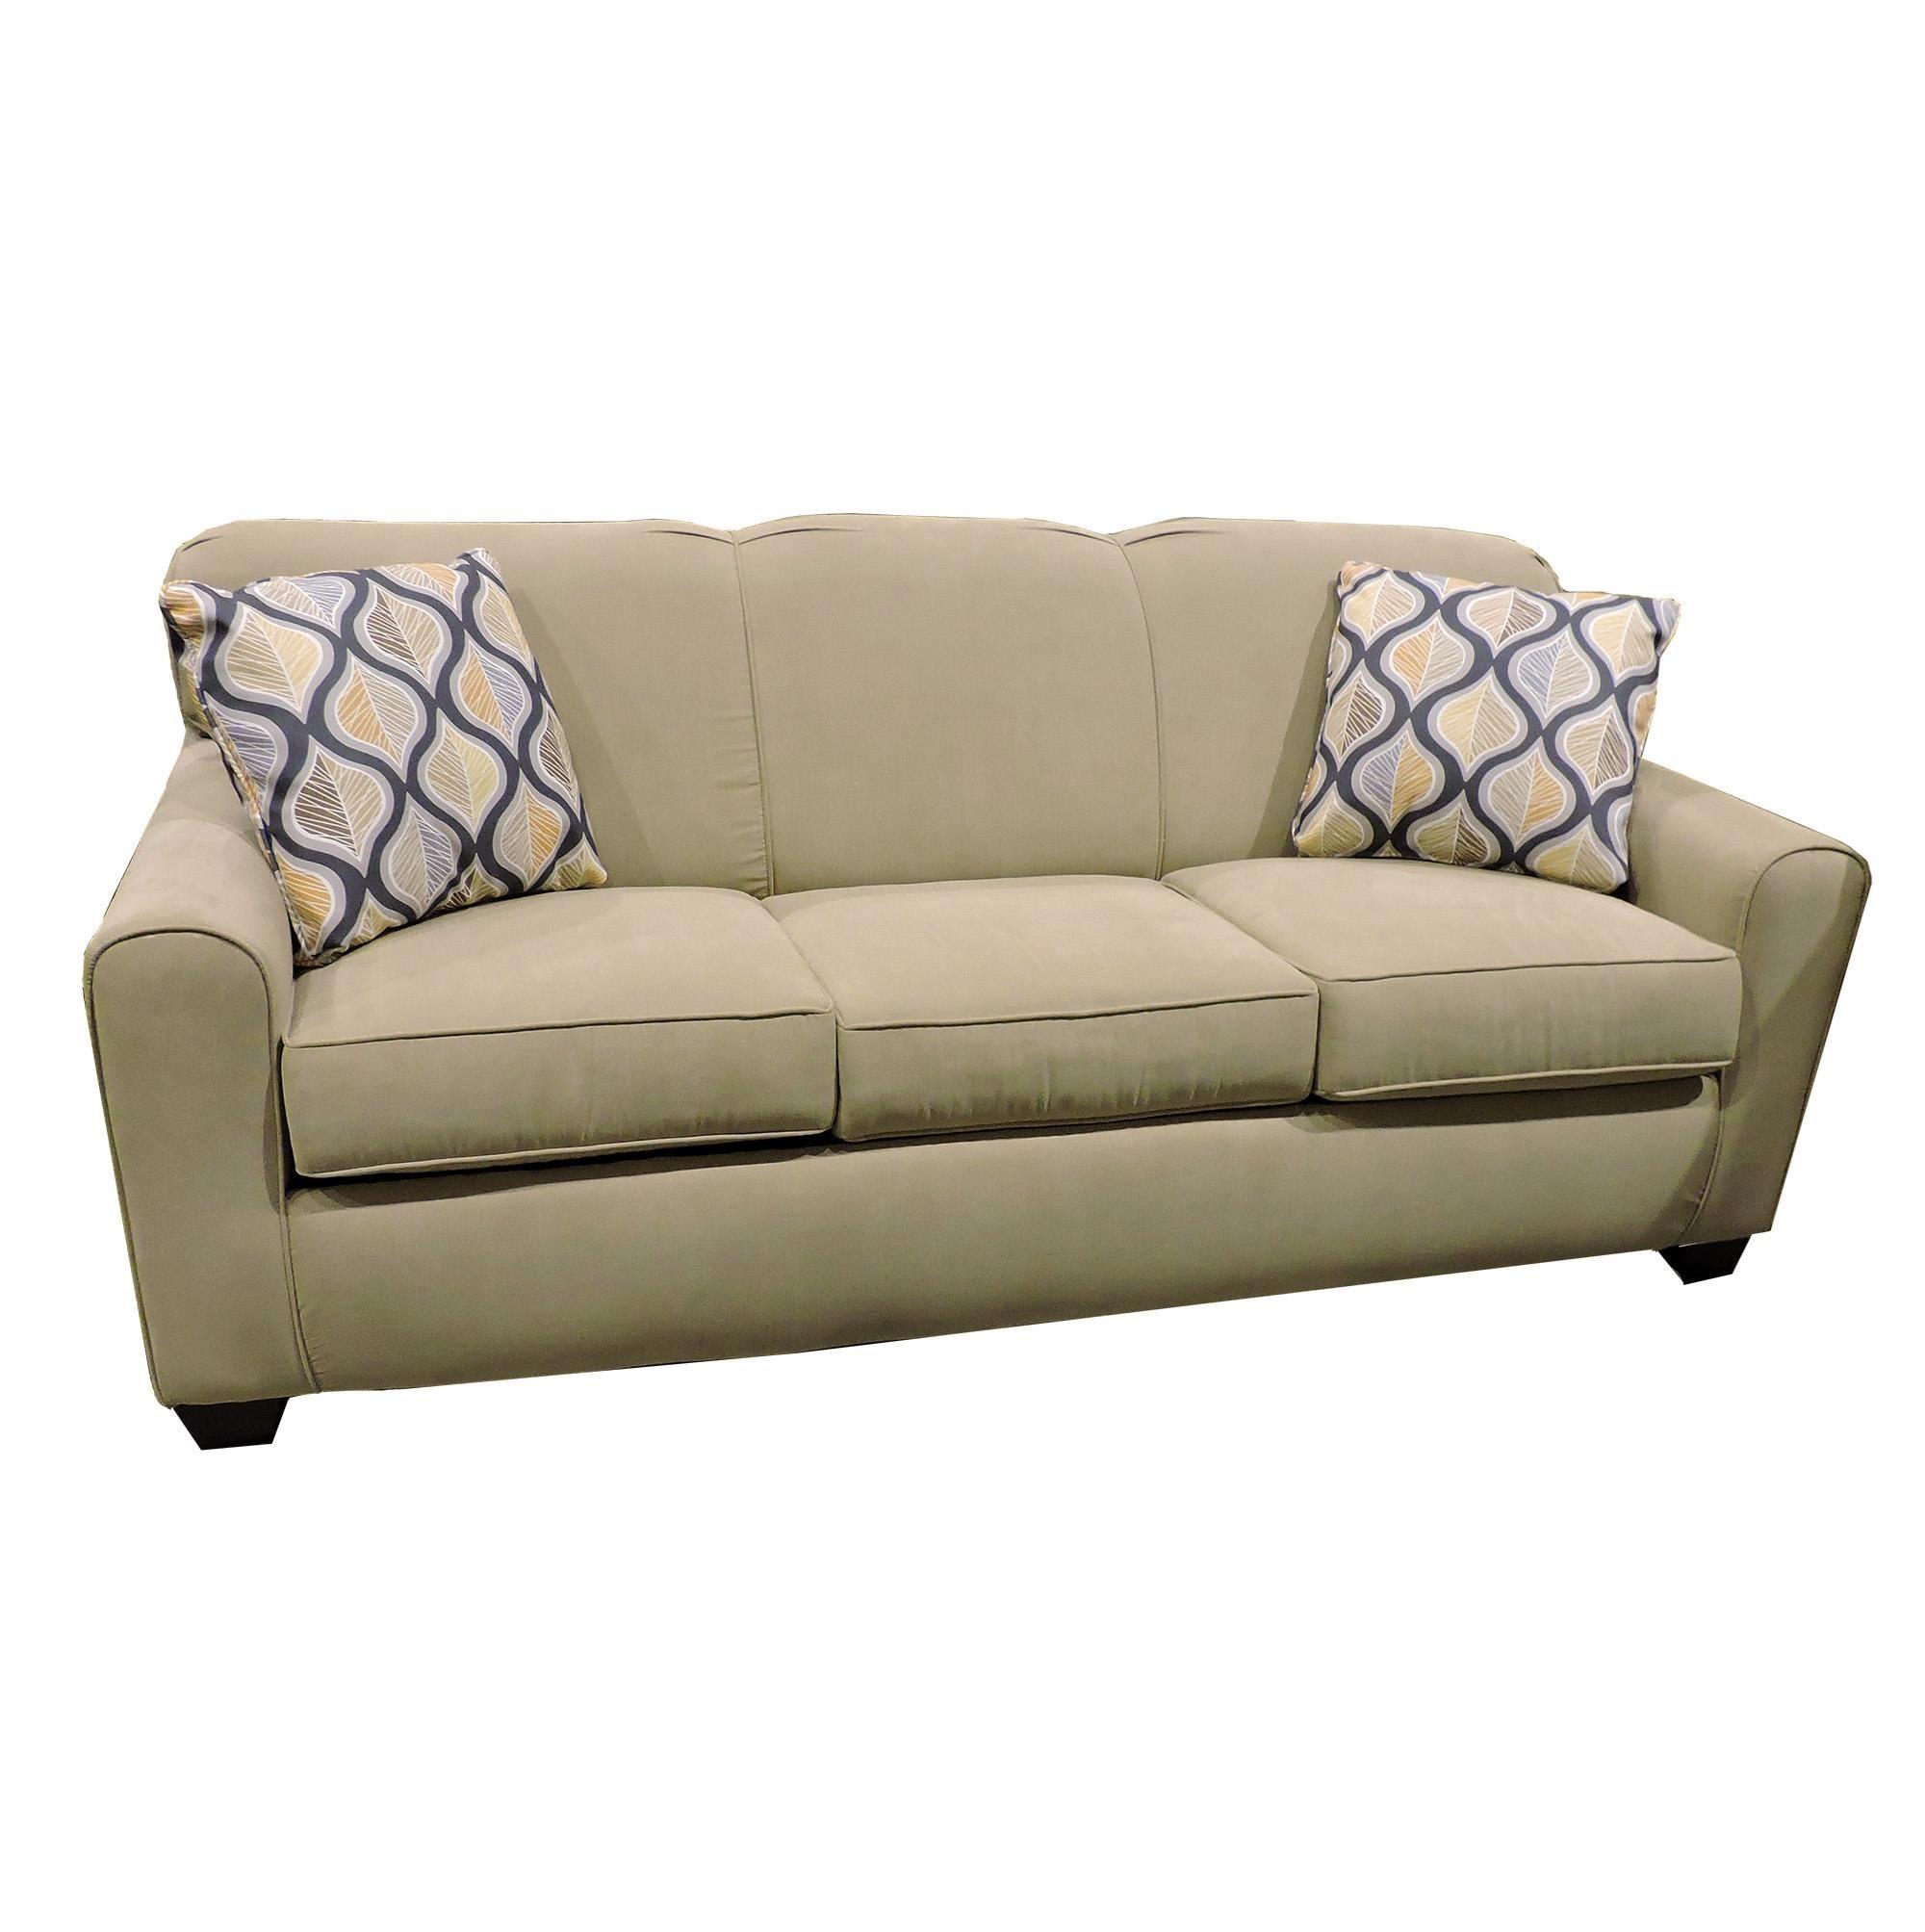 Belfort Basics Zuma  Queen Sleeper Sofa - Item Number: K71300 EQSL